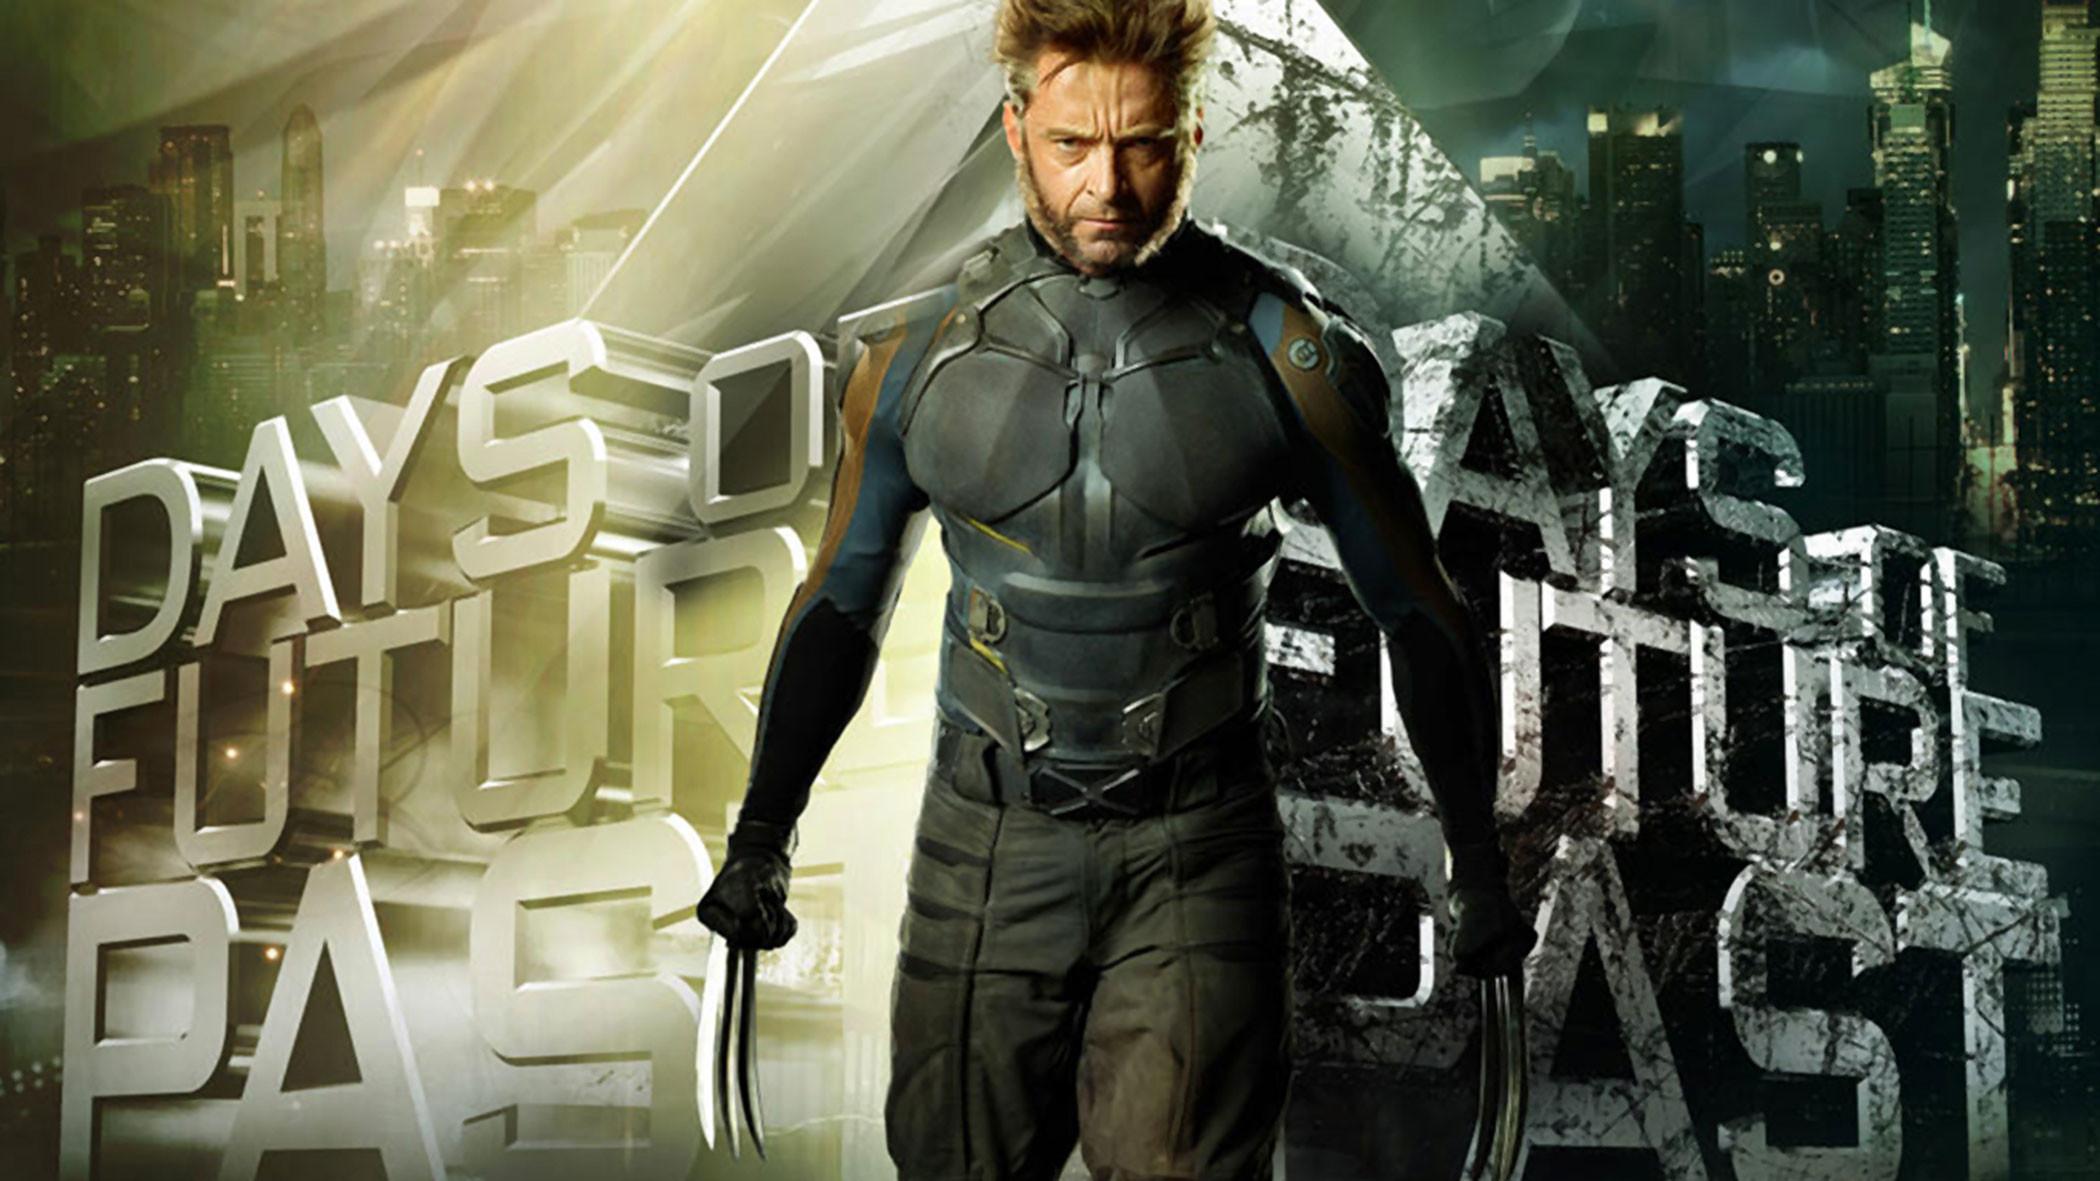 Res: 2100x1181, X Men Days Of Future Past Wolverine